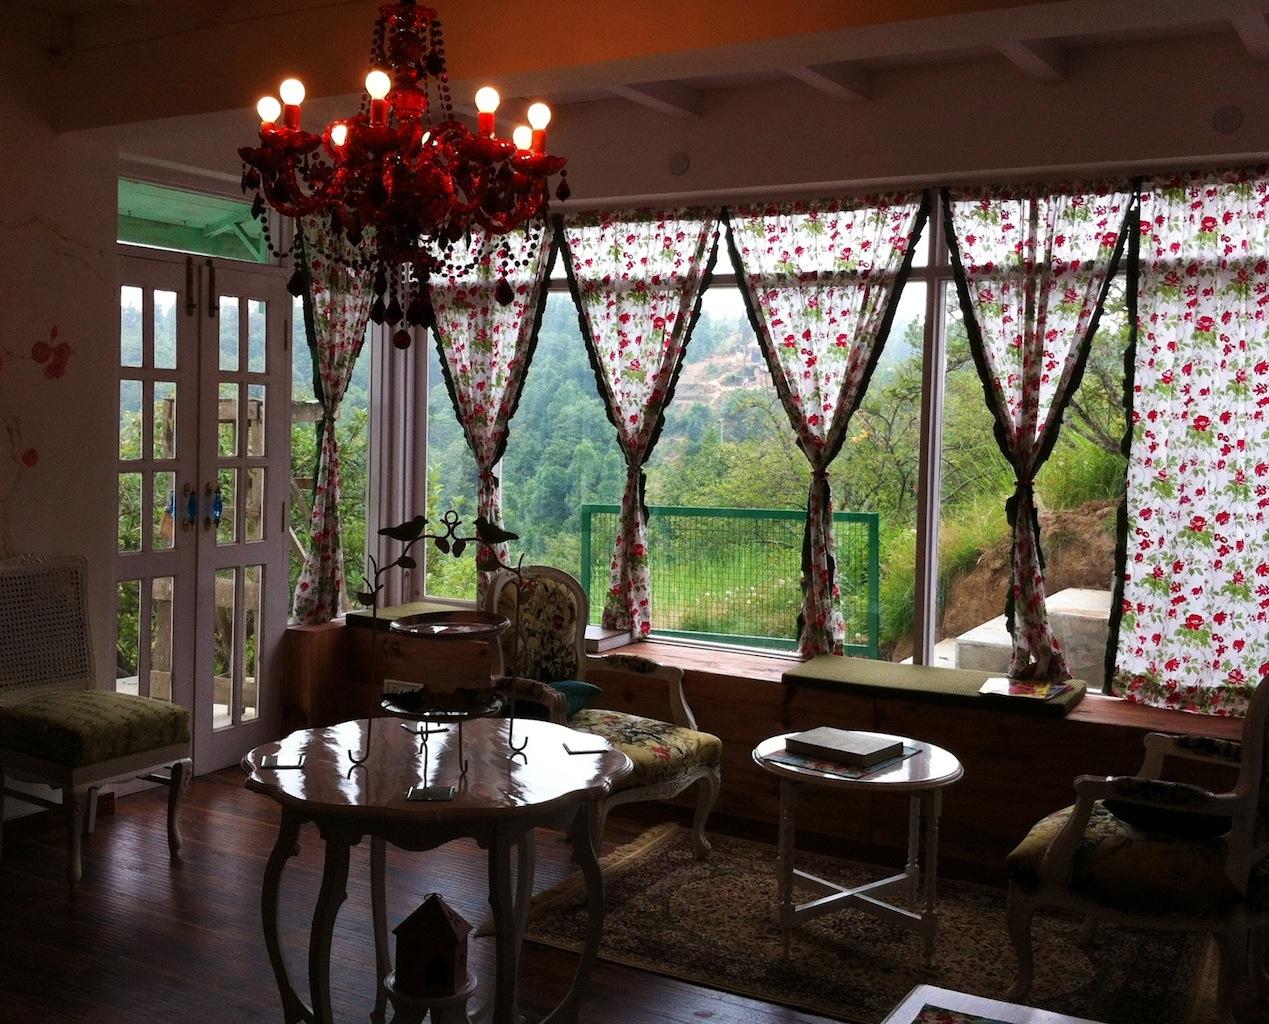 The charming tea room in Dhanachuli